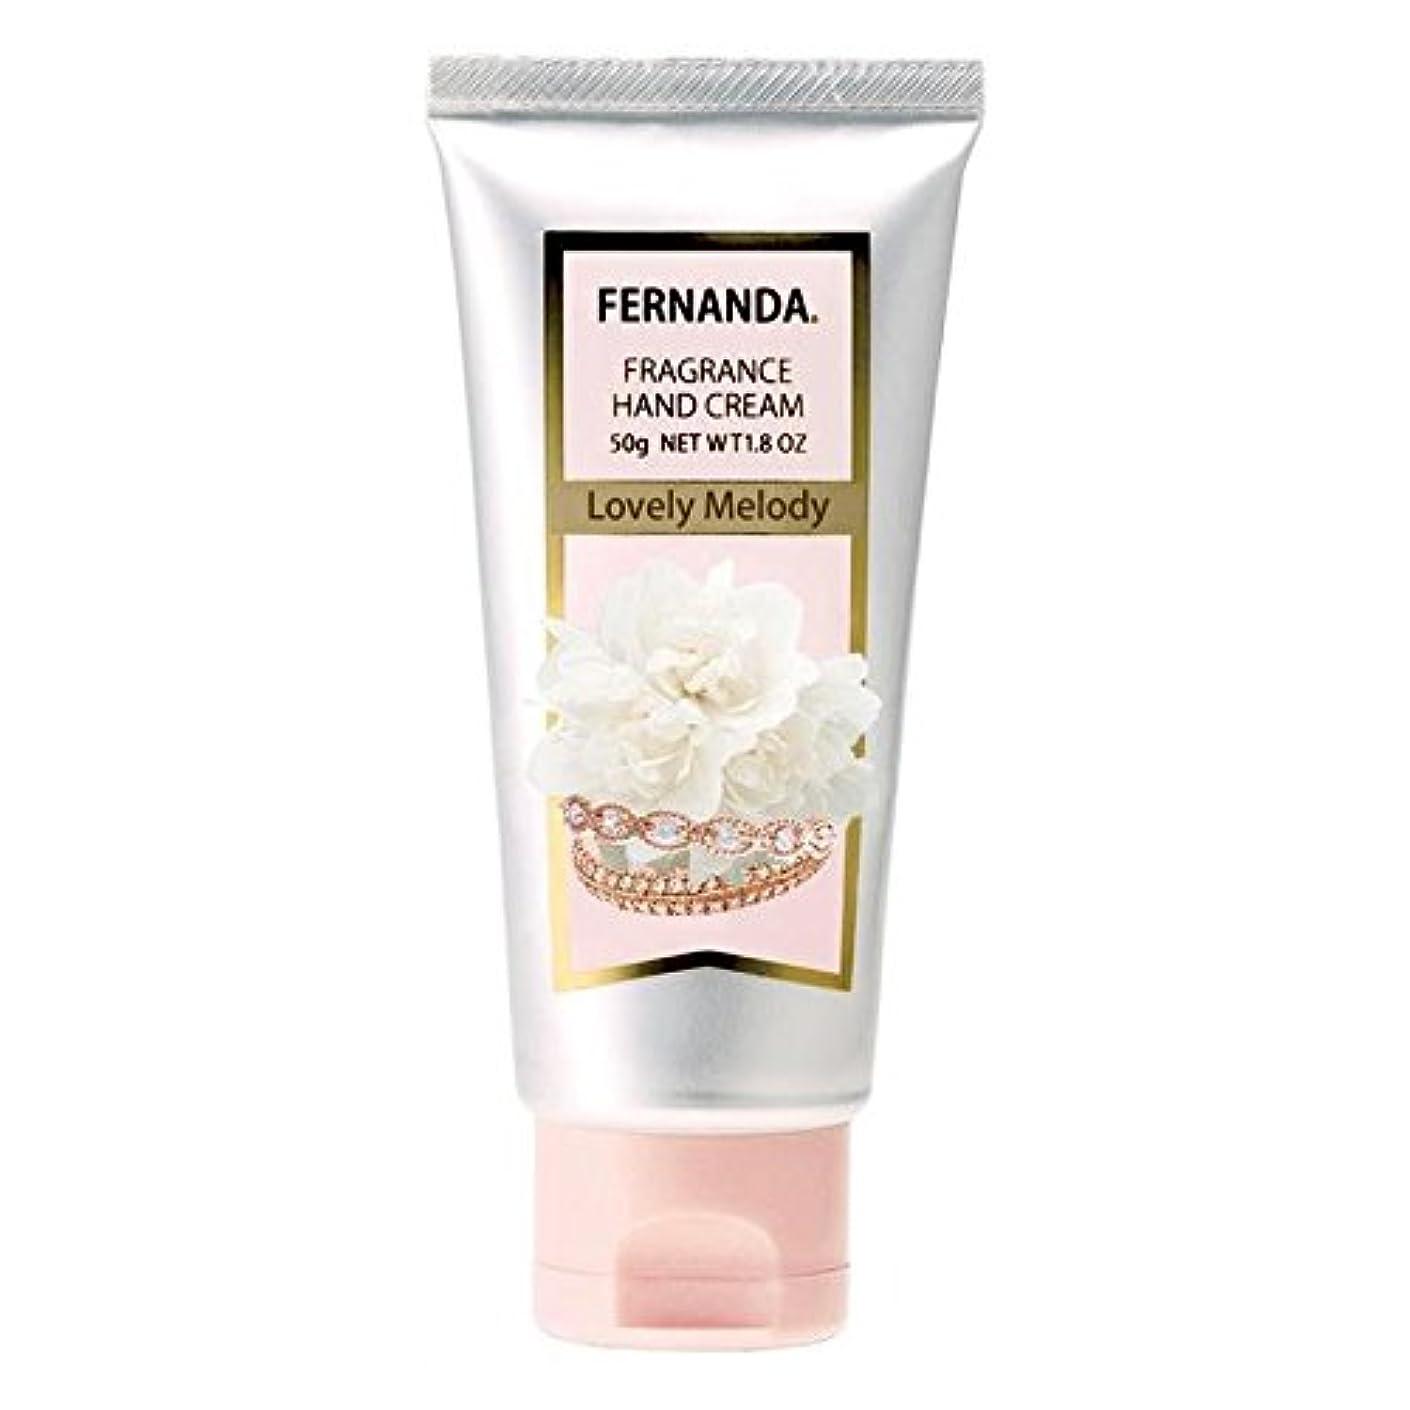 FERNANDA(フェルナンダ) Hand Cream Lovely Melody(ハンドクリーム ラブリーメロディー)